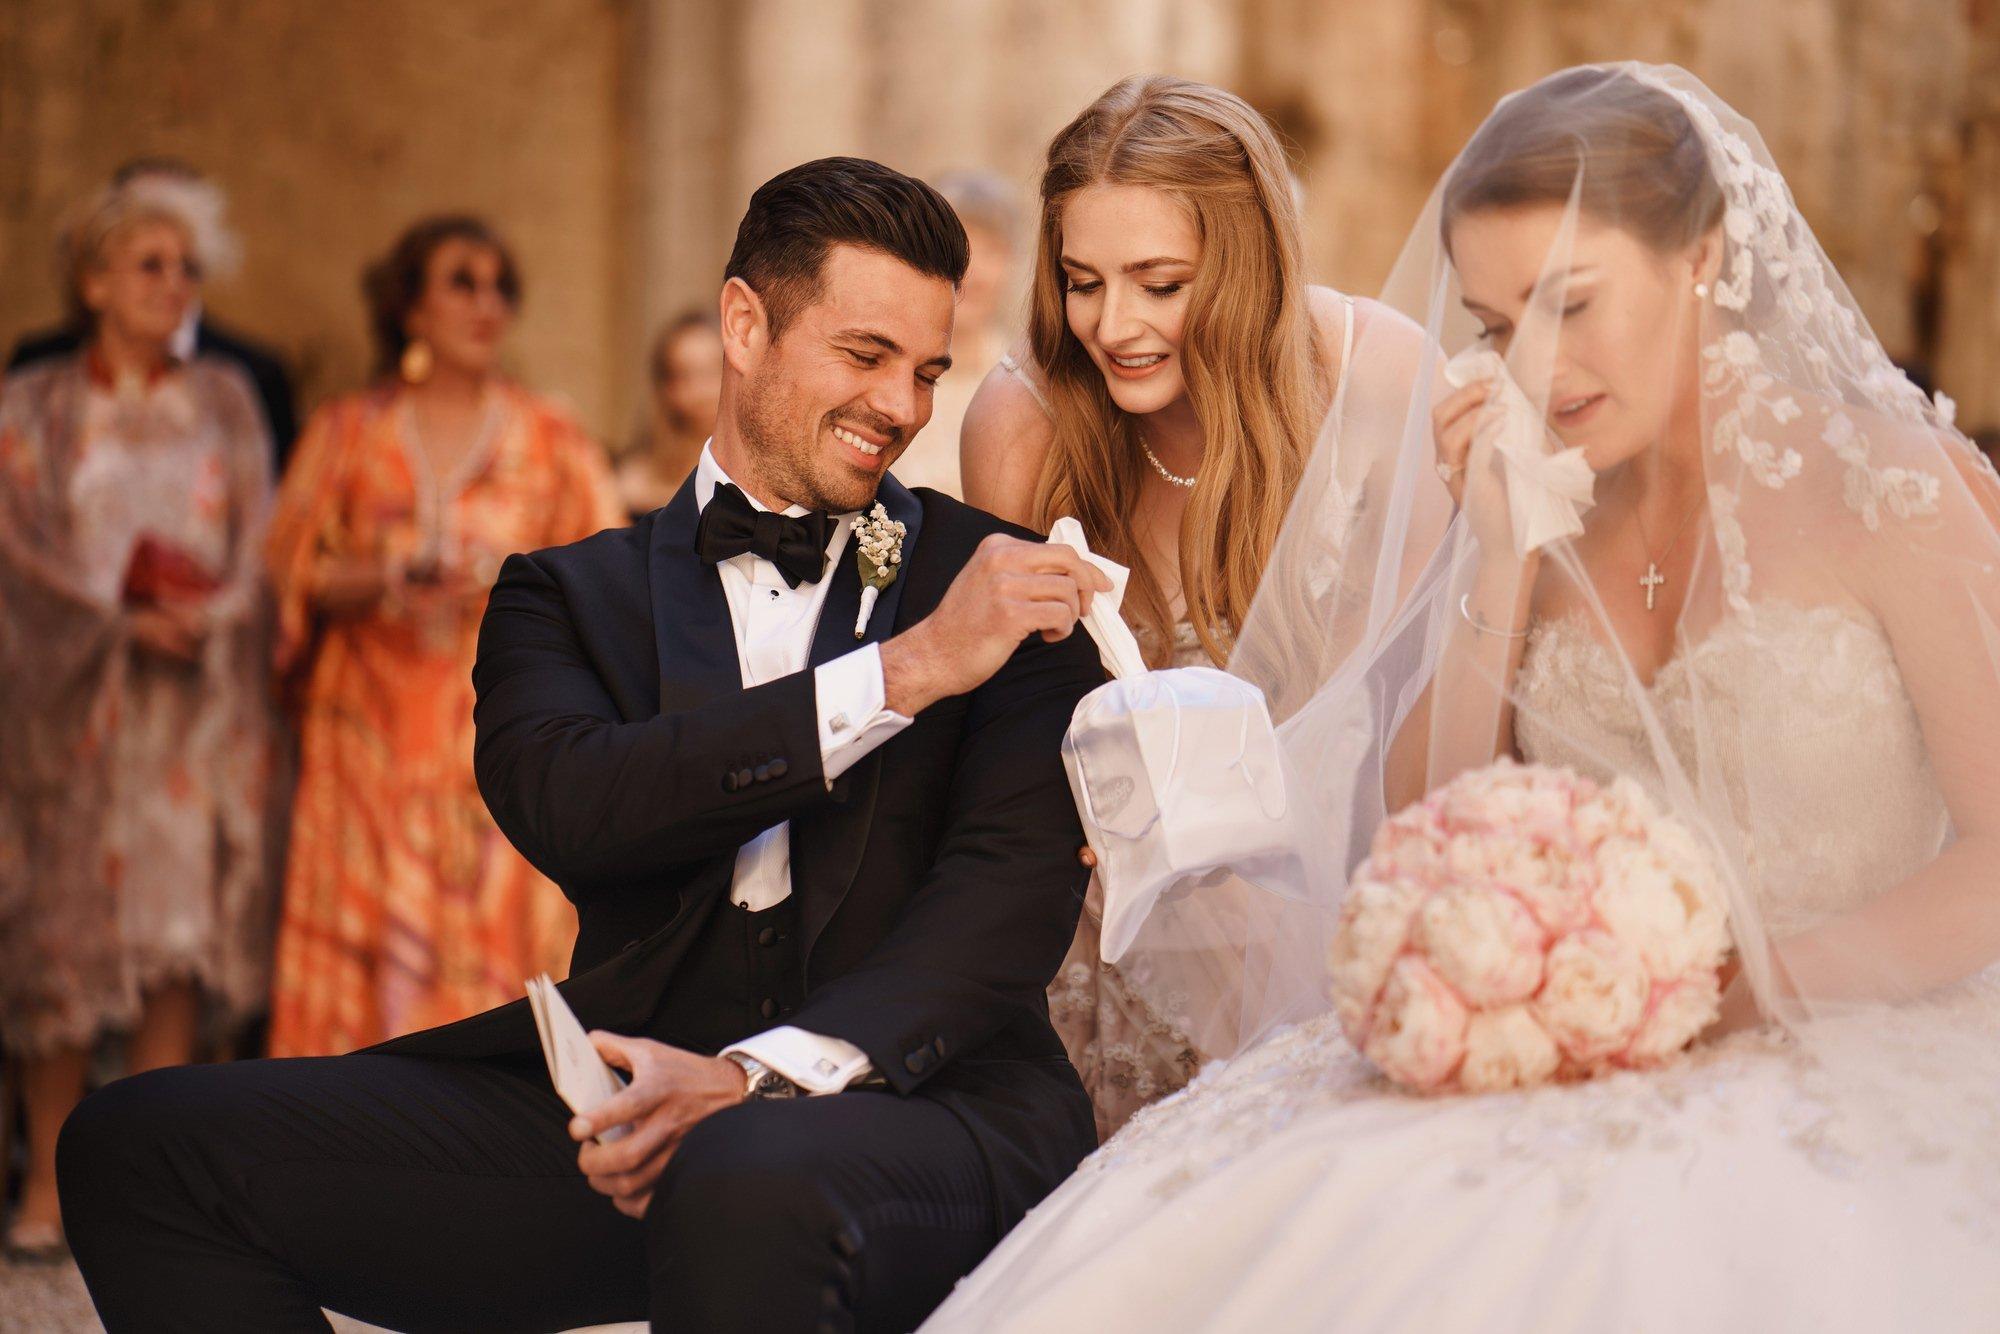 San Galgano Abbey Weddings - Luxury Destination Wedding Photography by ARJ Photography